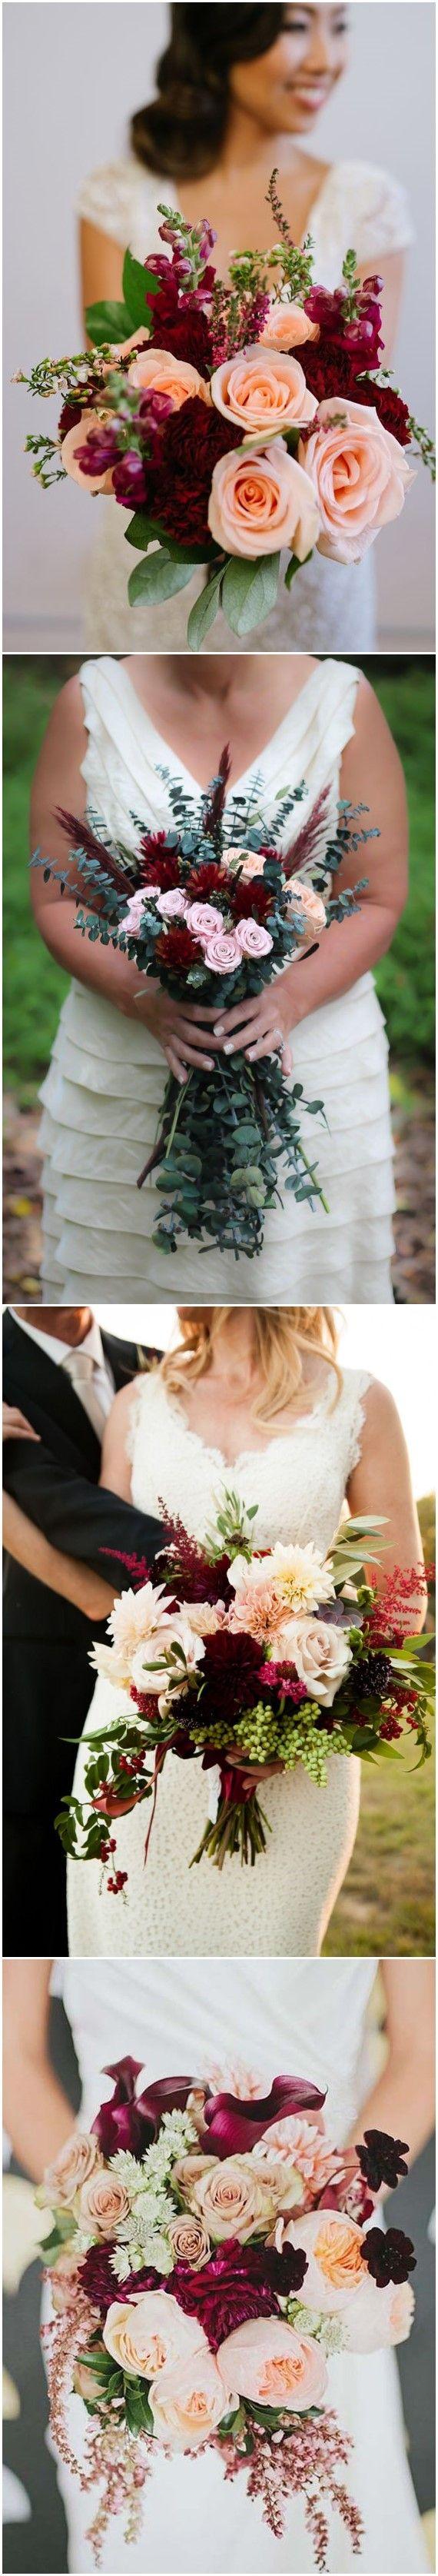 #WeddingBouquet»16 Elegant Burgundy and Blush Wedding Bouquet Ideas